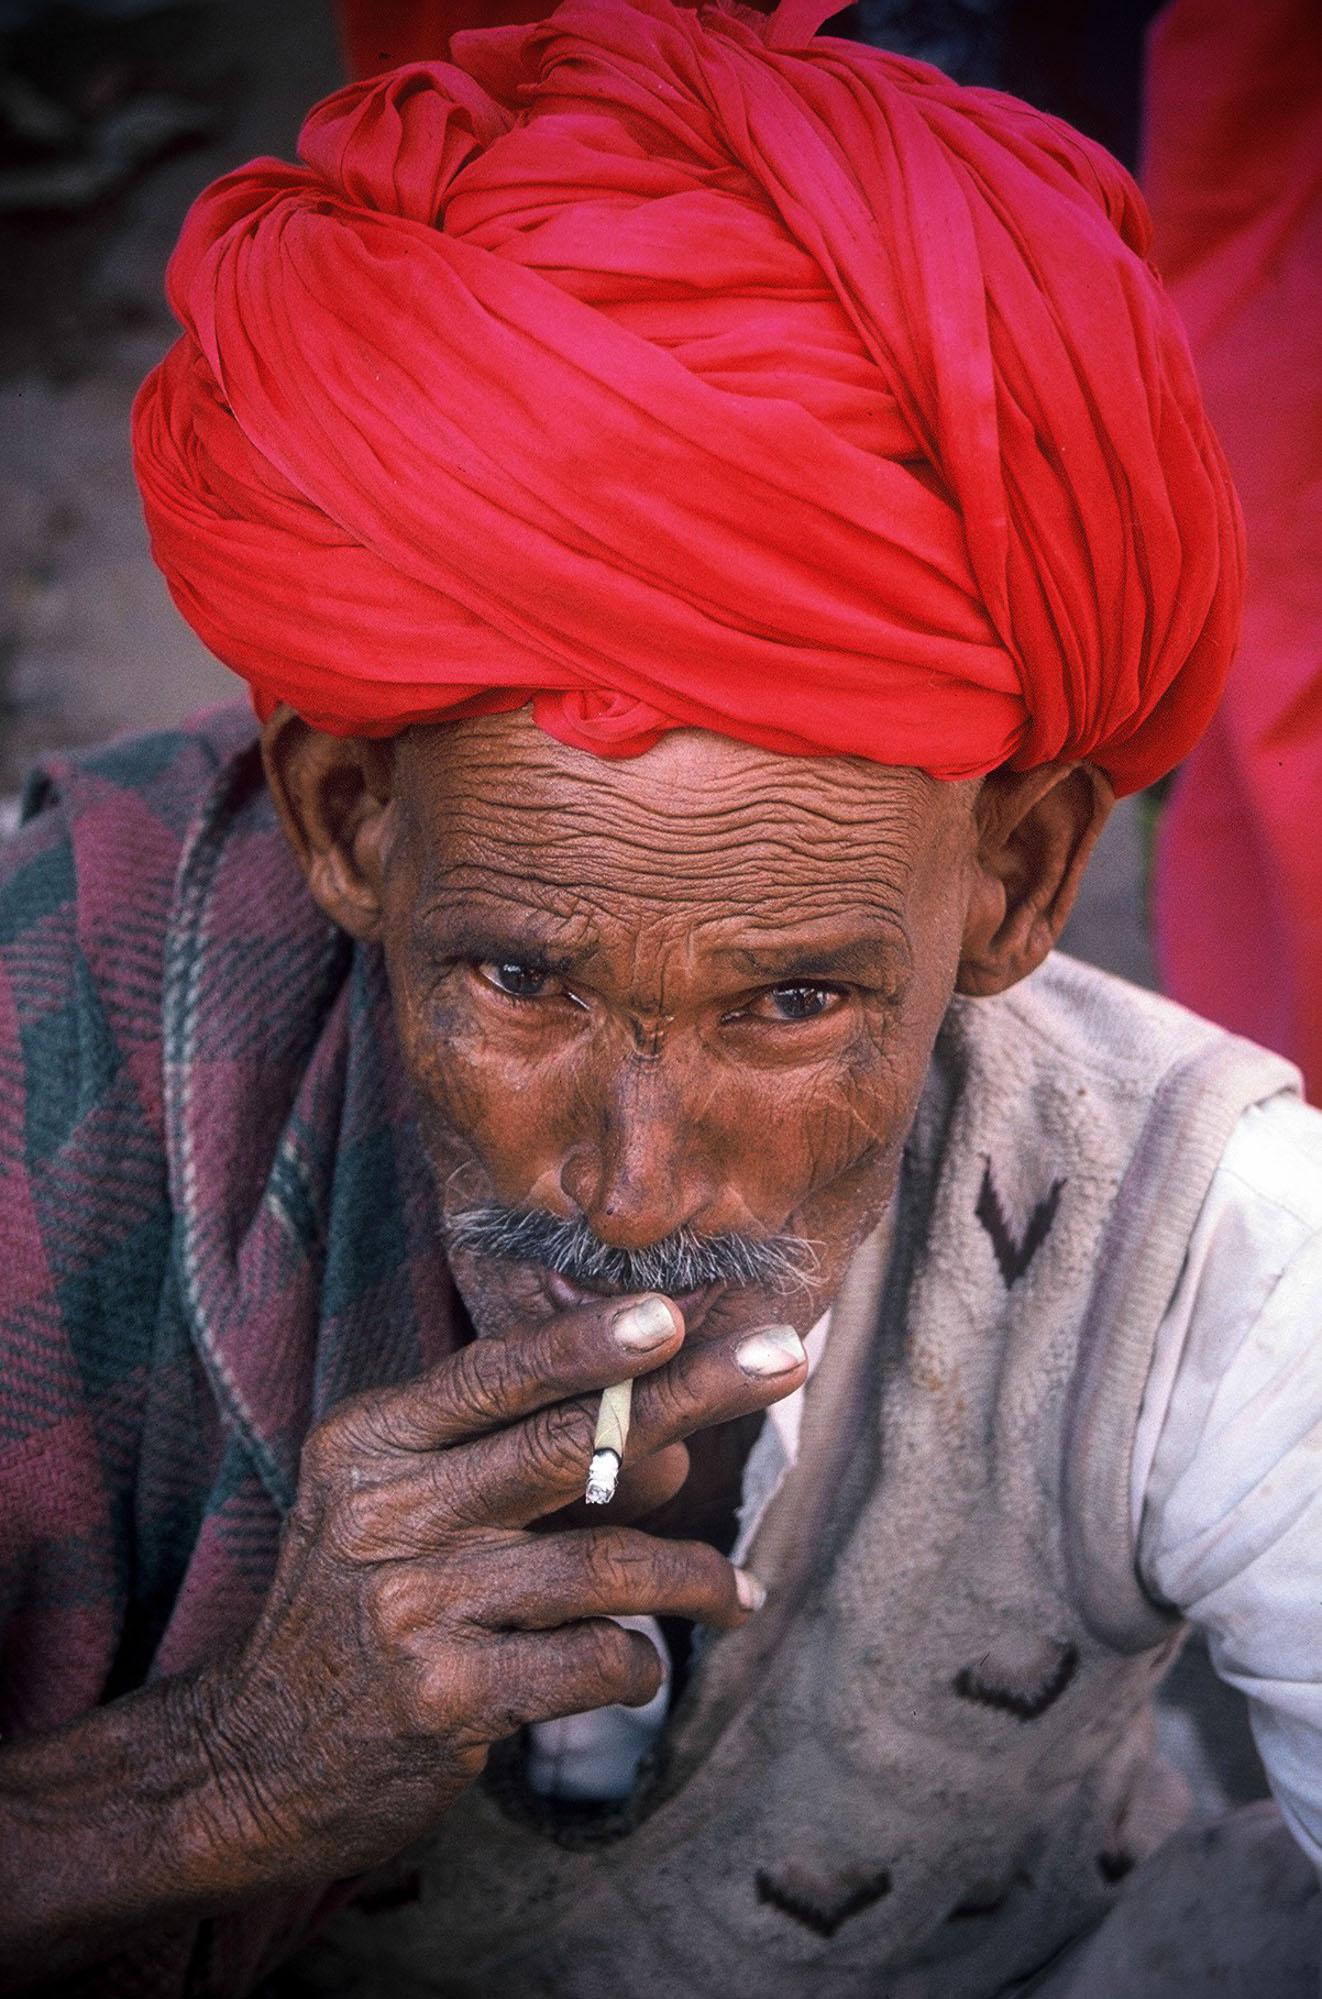 portraits-photographer-oxford-london-jonathan-self-photography_-6.jpg